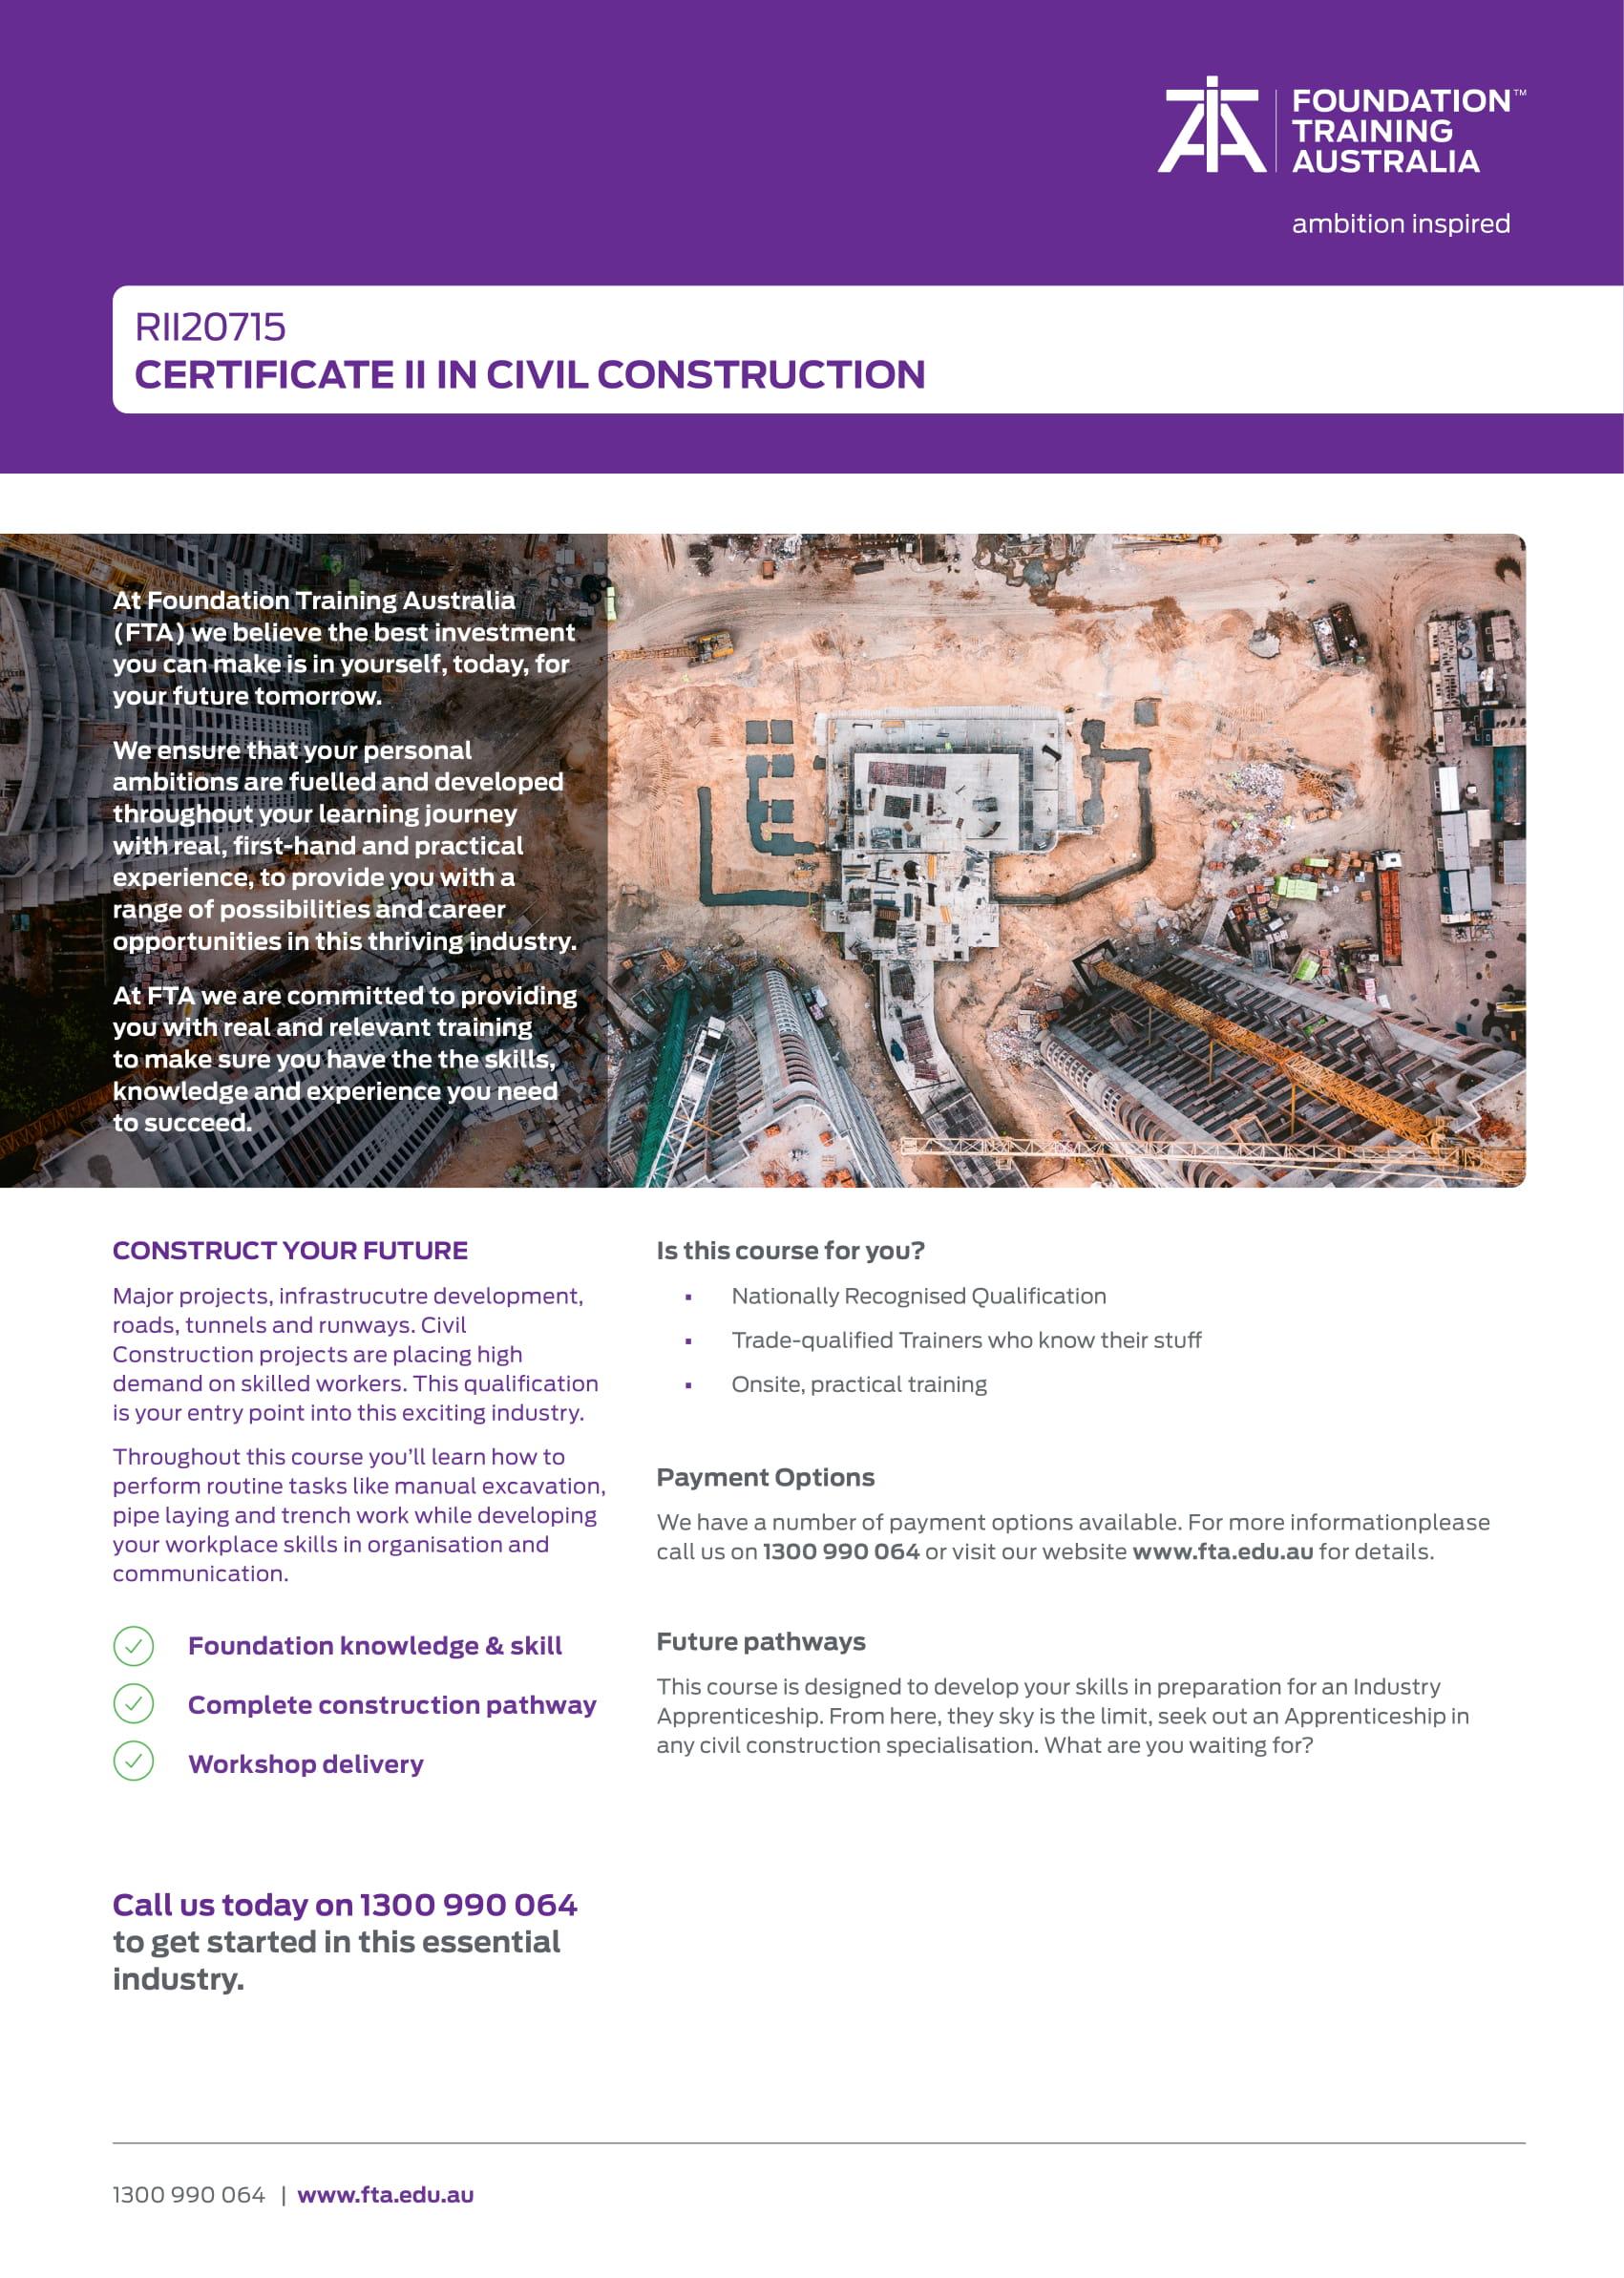 https://www.fta.edu.au/wp-content/uploads/2020/06/TP1.MK_.165.Certificate-II-Civil-Construction-Course-Flyer-RII20715-V1-1.jpg